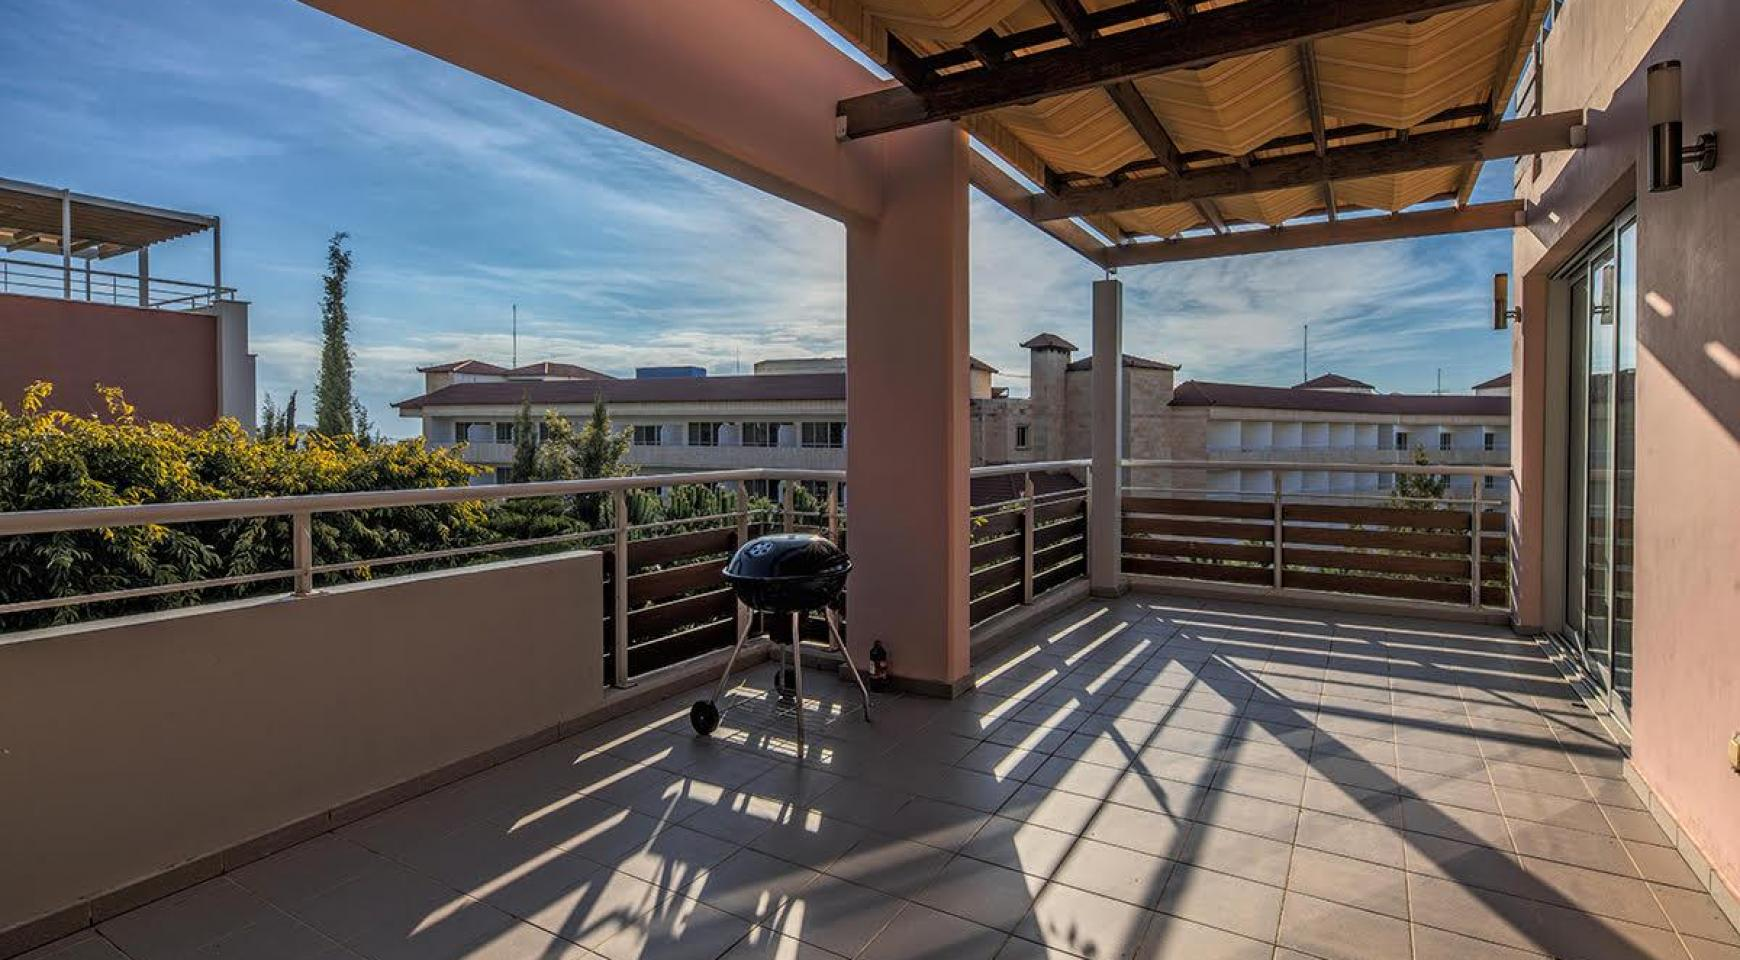 2 Bedroom Duplex Apartment Amathusa O 104 in a Prestigious Complex near the Sea  - 8